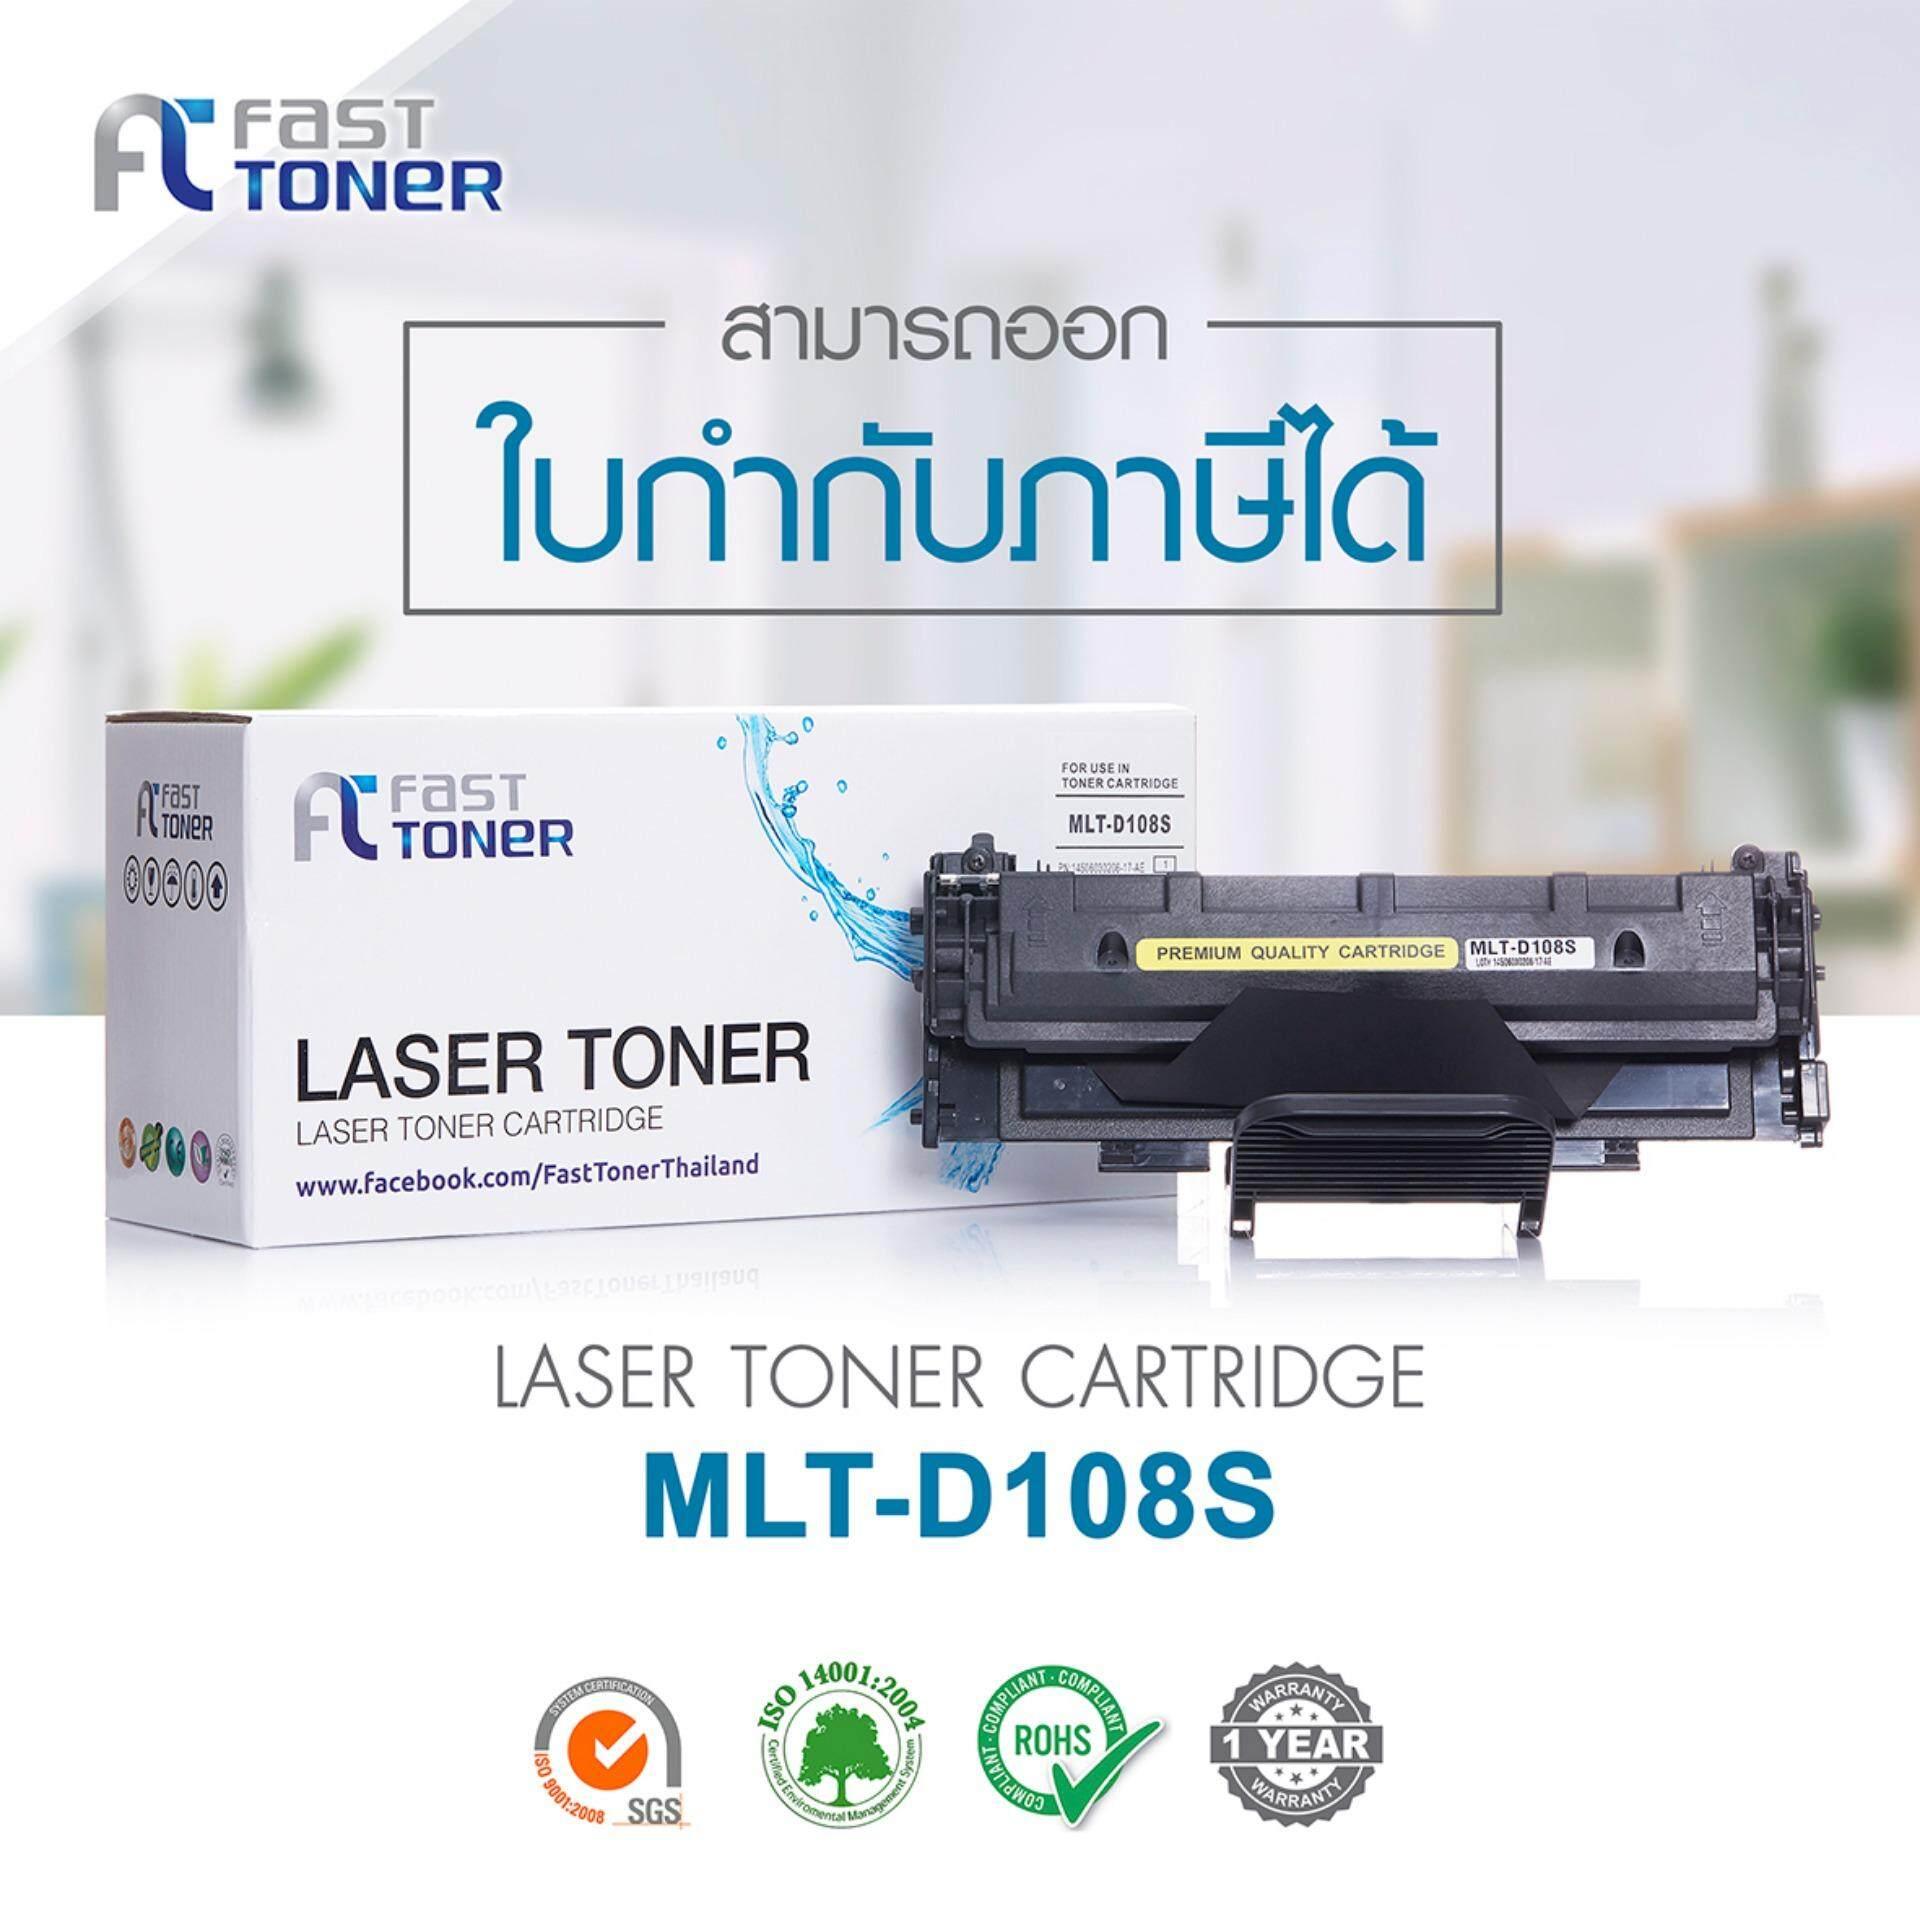 Fast Toner ตลับหมึกเทียบเท่า Samsung MLT-D108S สำหรับปริ้นเตอร์รุ่น Samsung ML-1640 Samsung ML-1641 Samsung ML-1642 Samsung ML-1645 Samsung ML-2240 Samsung ML-2241